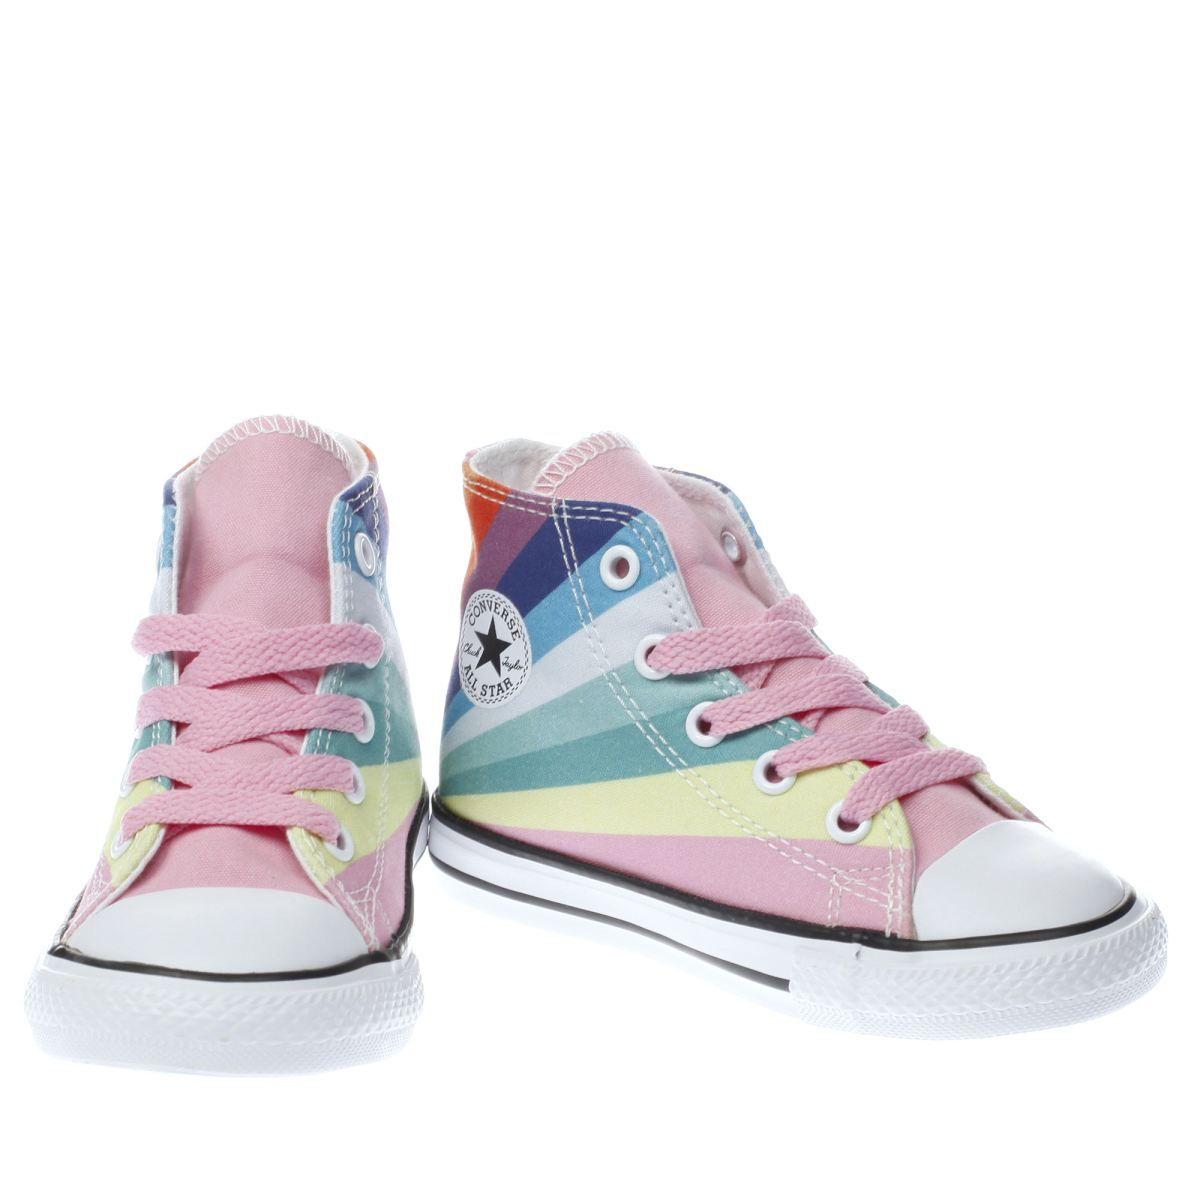 4b10fcd4081 kids converse pink all star ox rainbow girls toddler